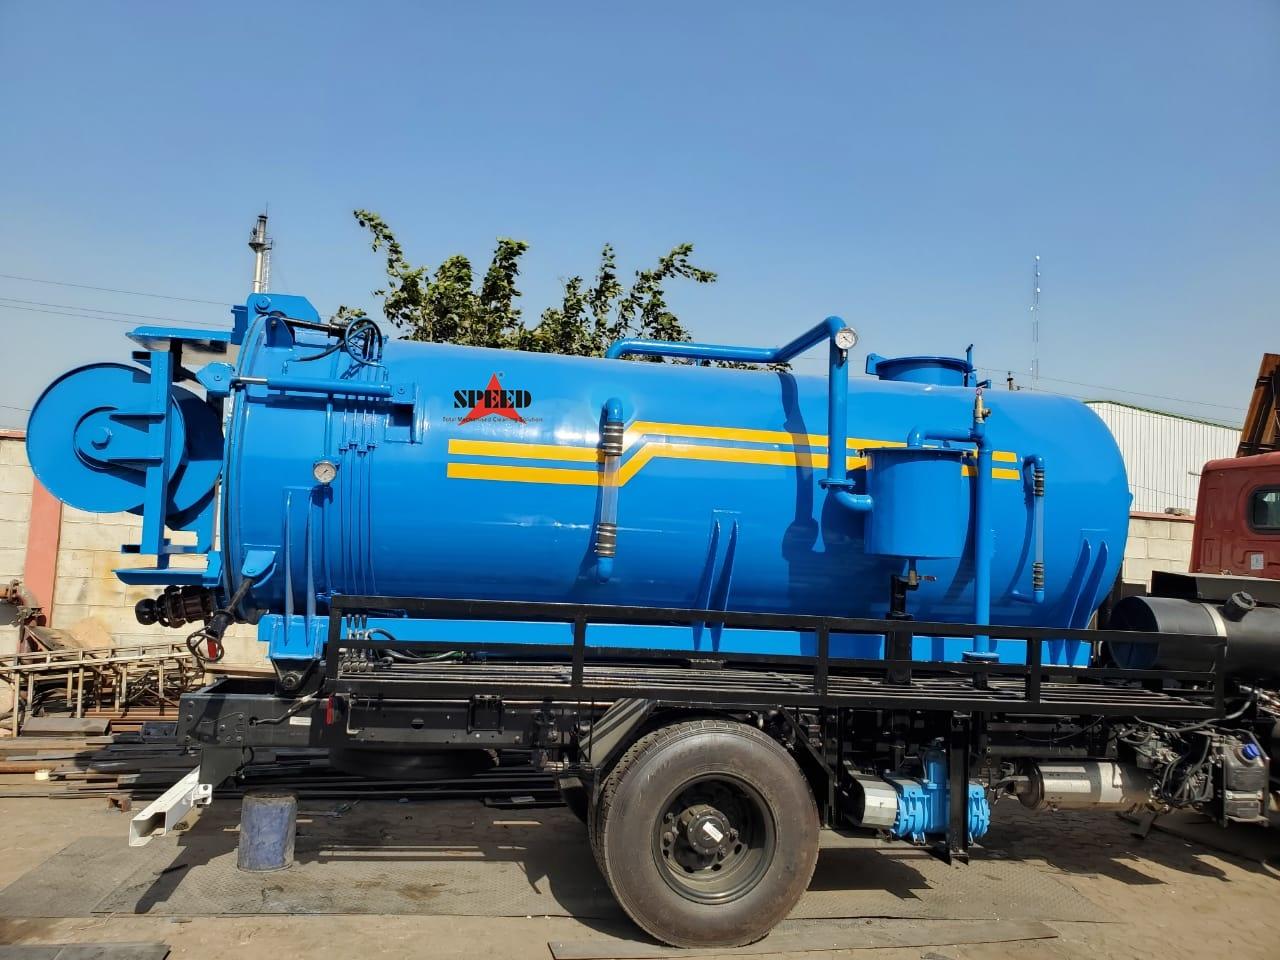 Sewer Suction Cum Jetting Machine Manufacturers